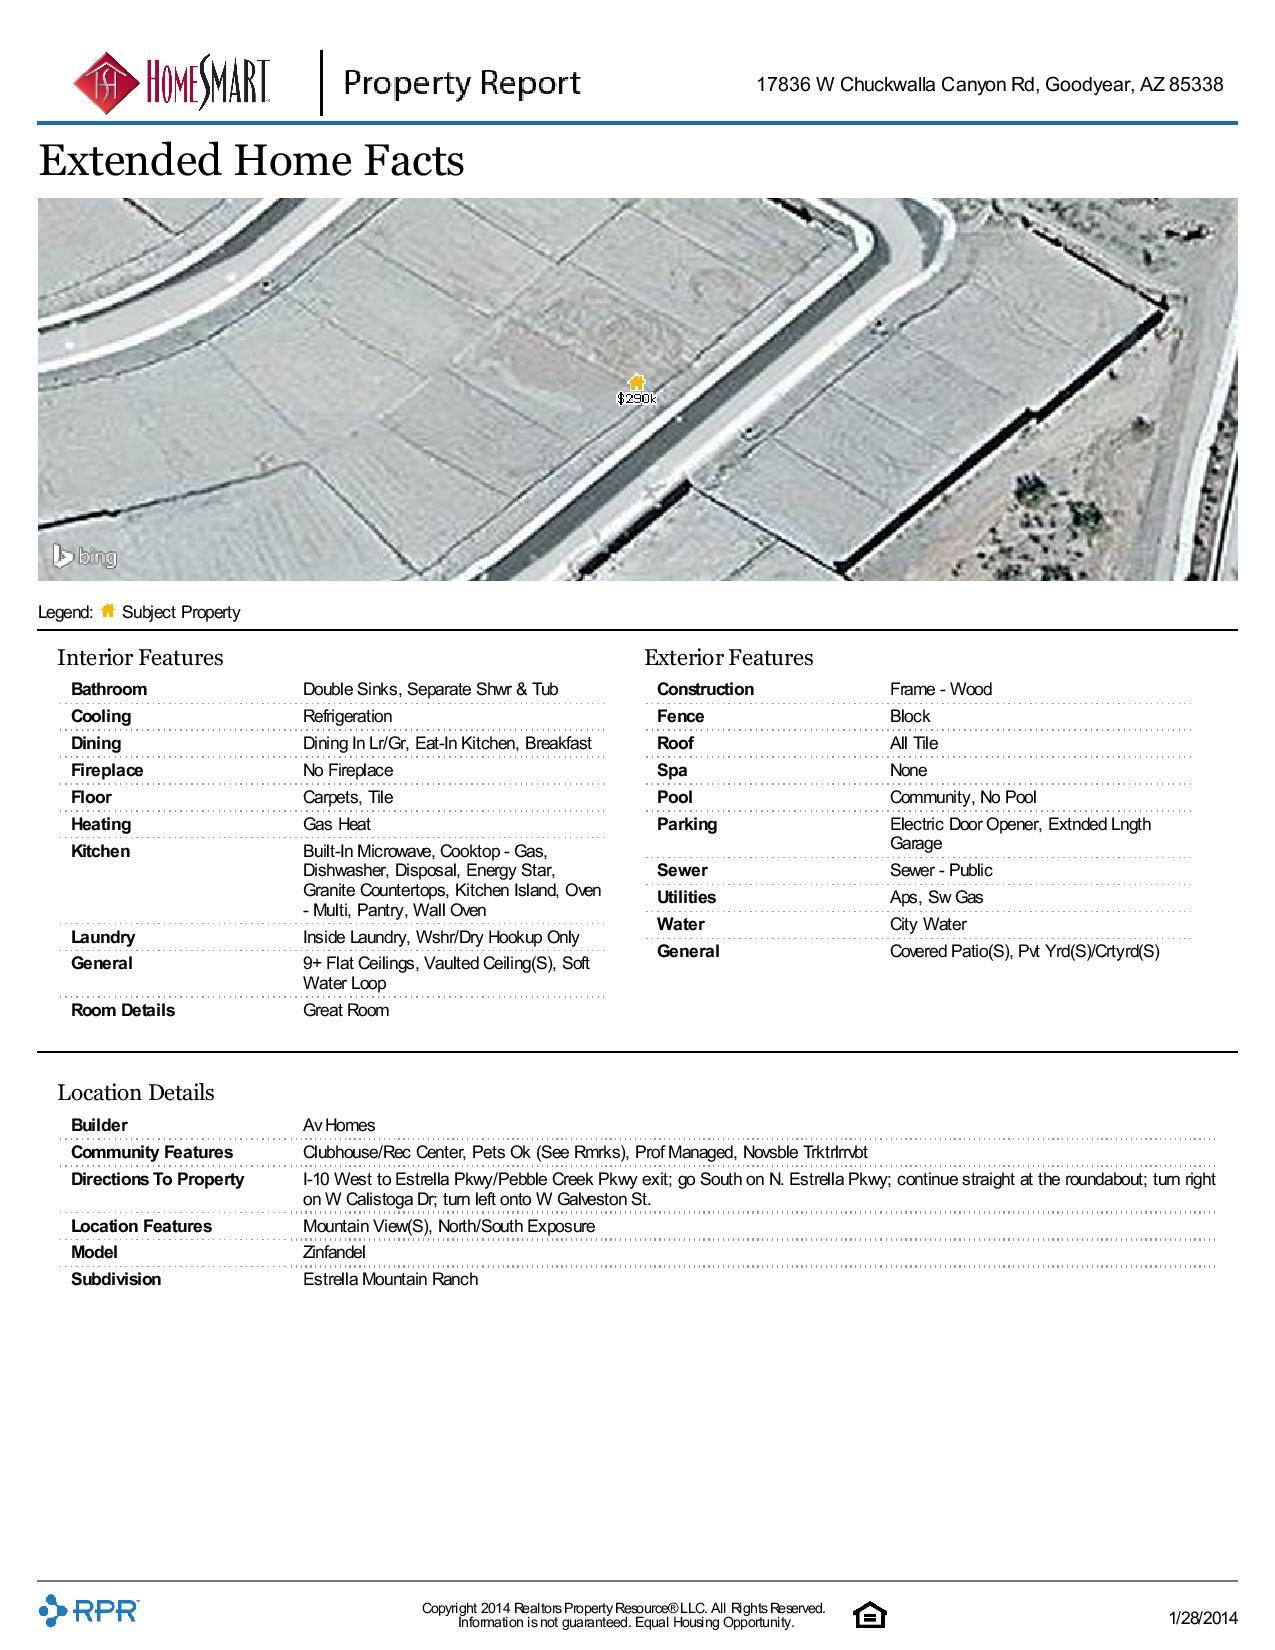 17836-W-Chuckwalla-Canyon-Rd-Goodyear-AZ-85338.pdf-page-004